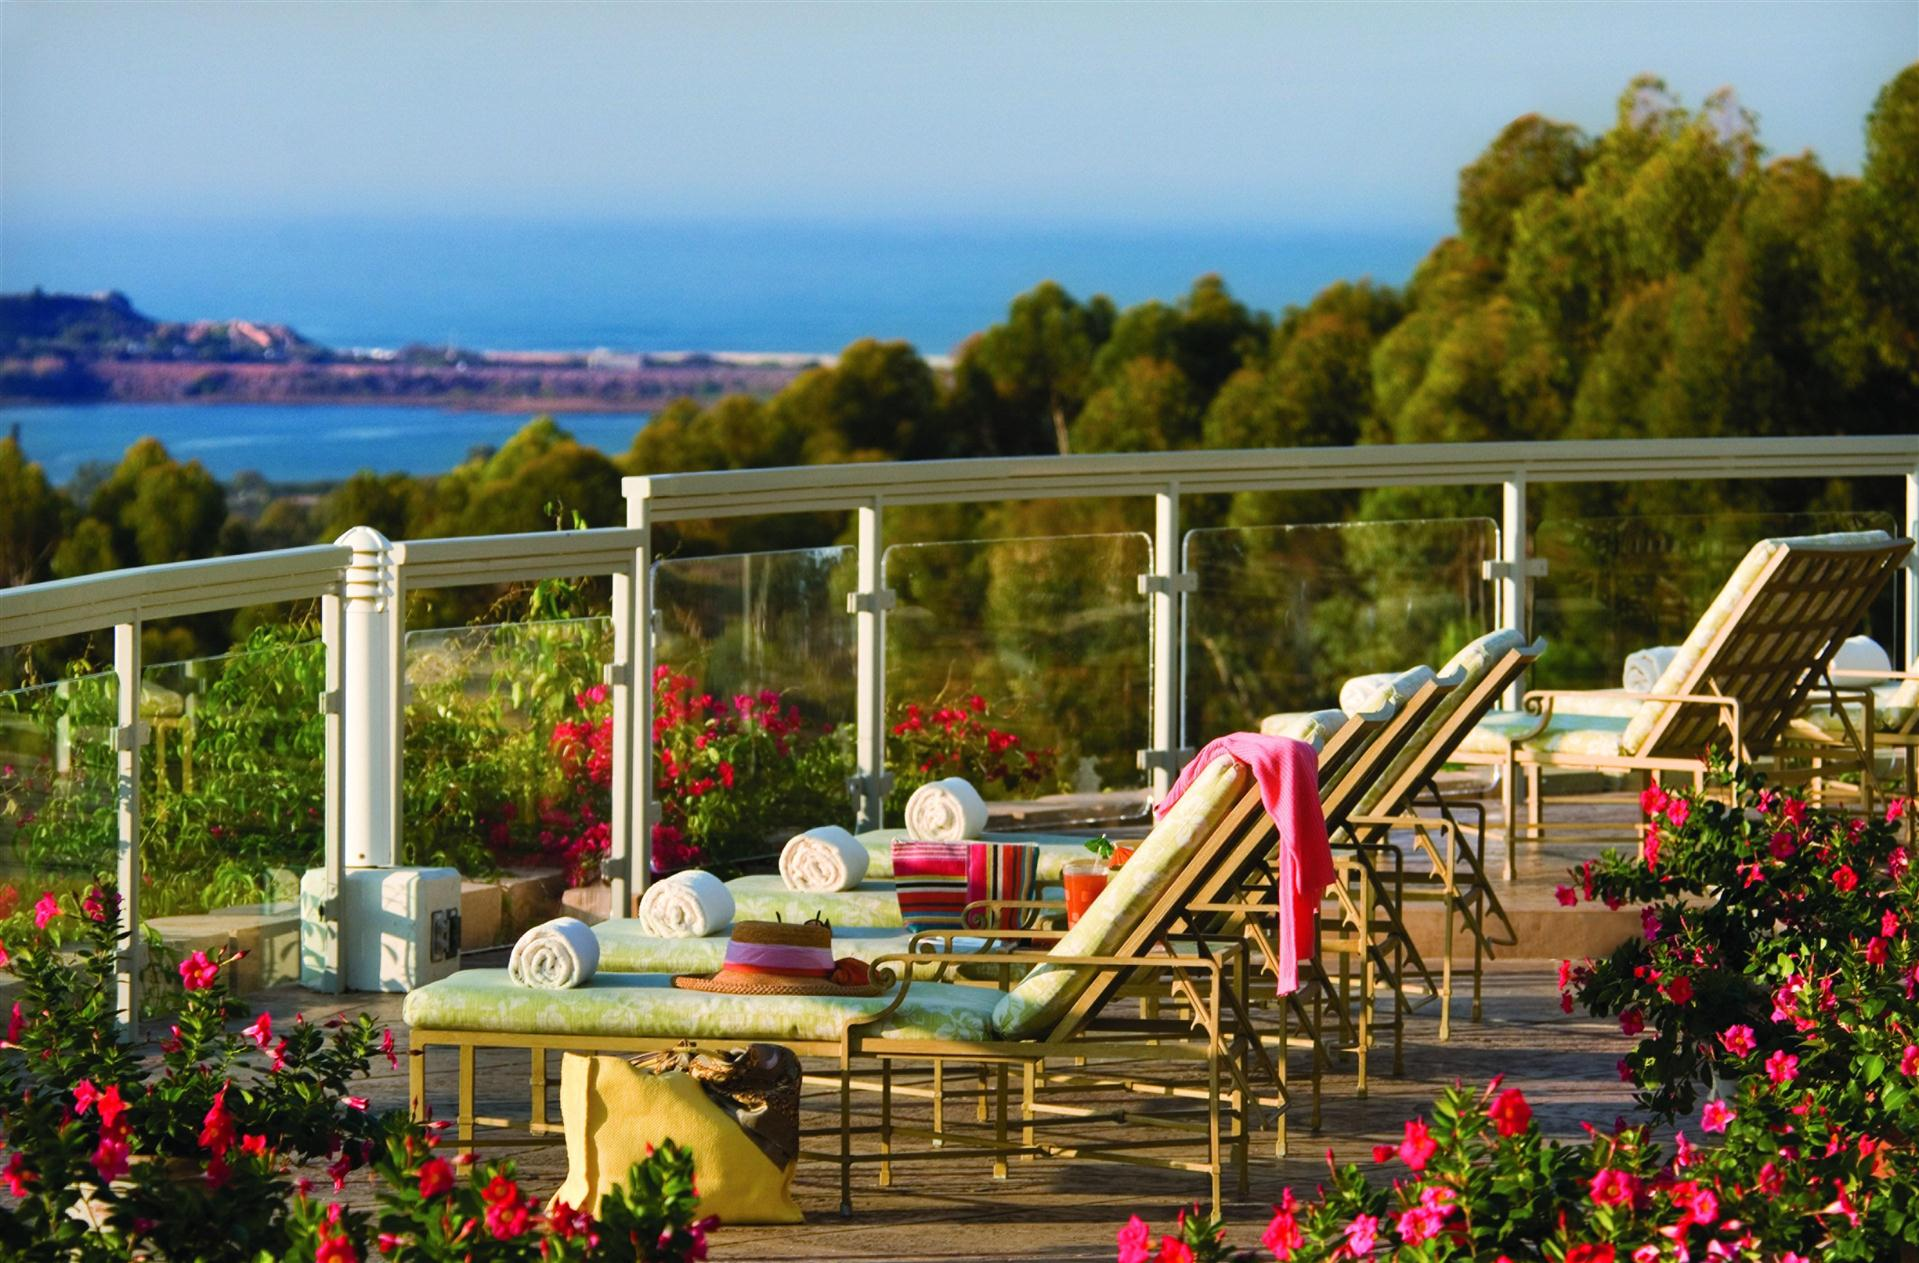 Meetings and Events at Park Hyatt Aviara Resort, Golf Club & Spa ...